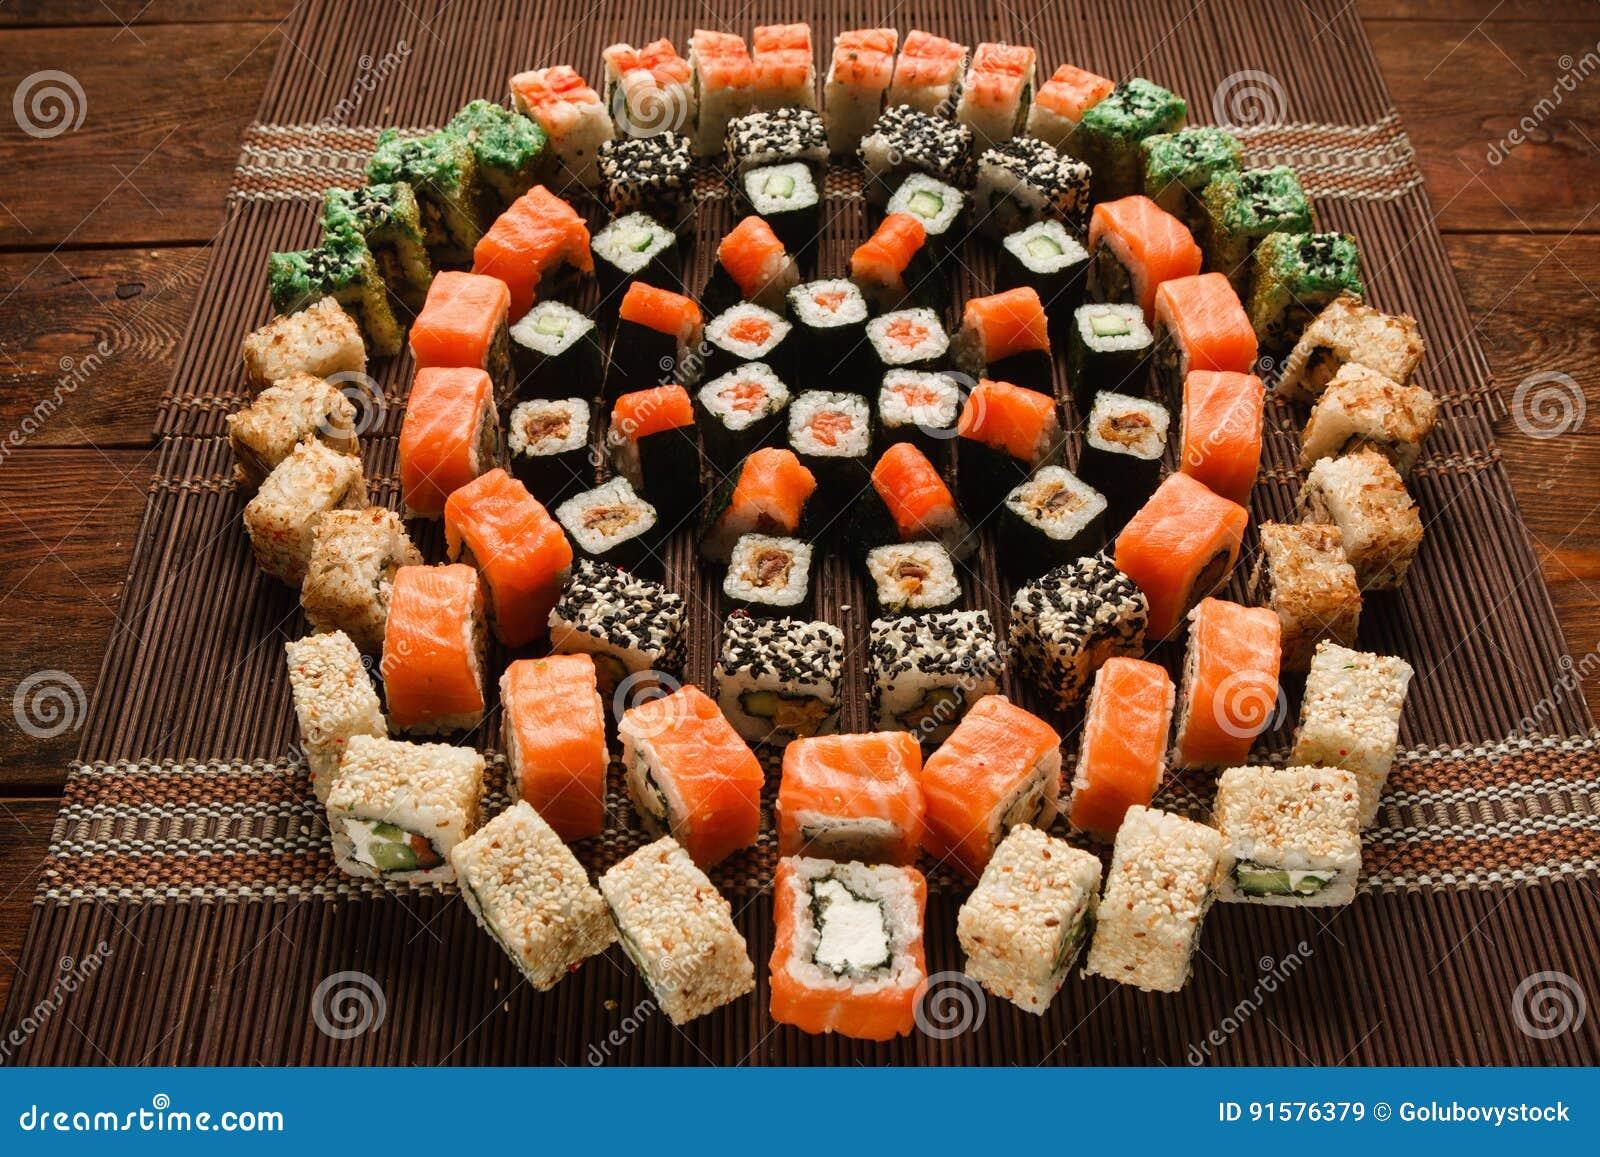 Food Art Sushi Roll Ornament Japanese Restaurant Stock Image Image Of Fish Asia 91576379